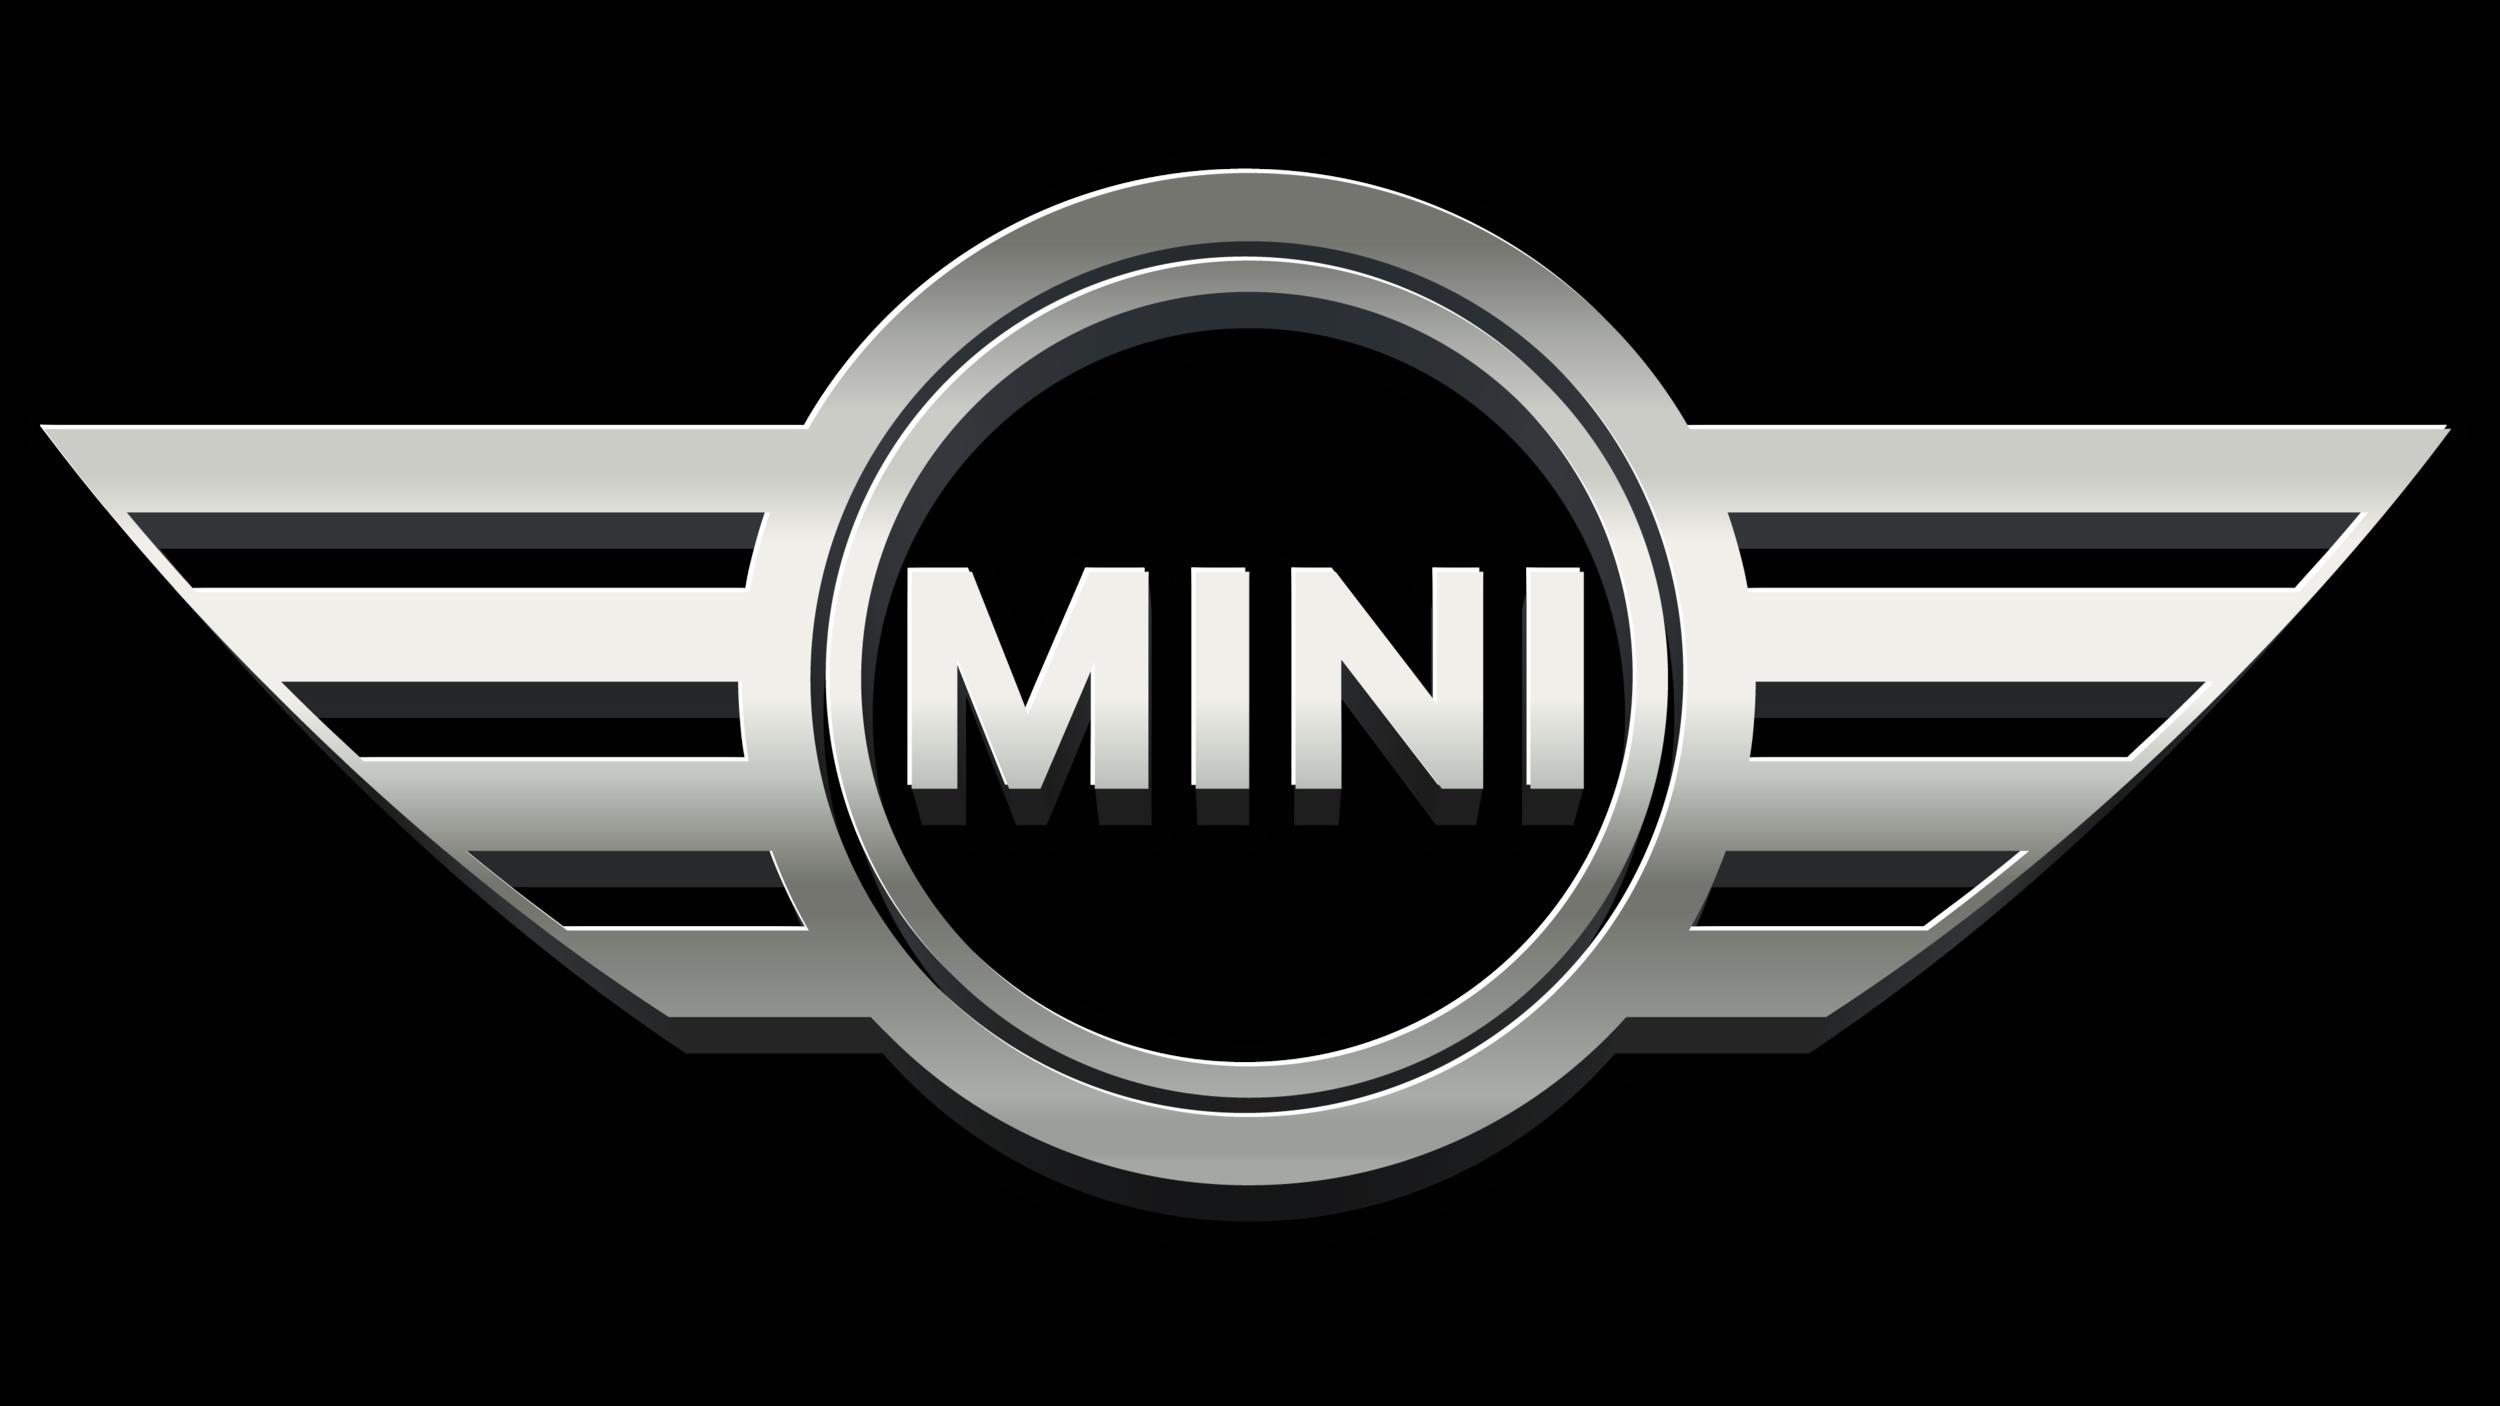 minicooper.png